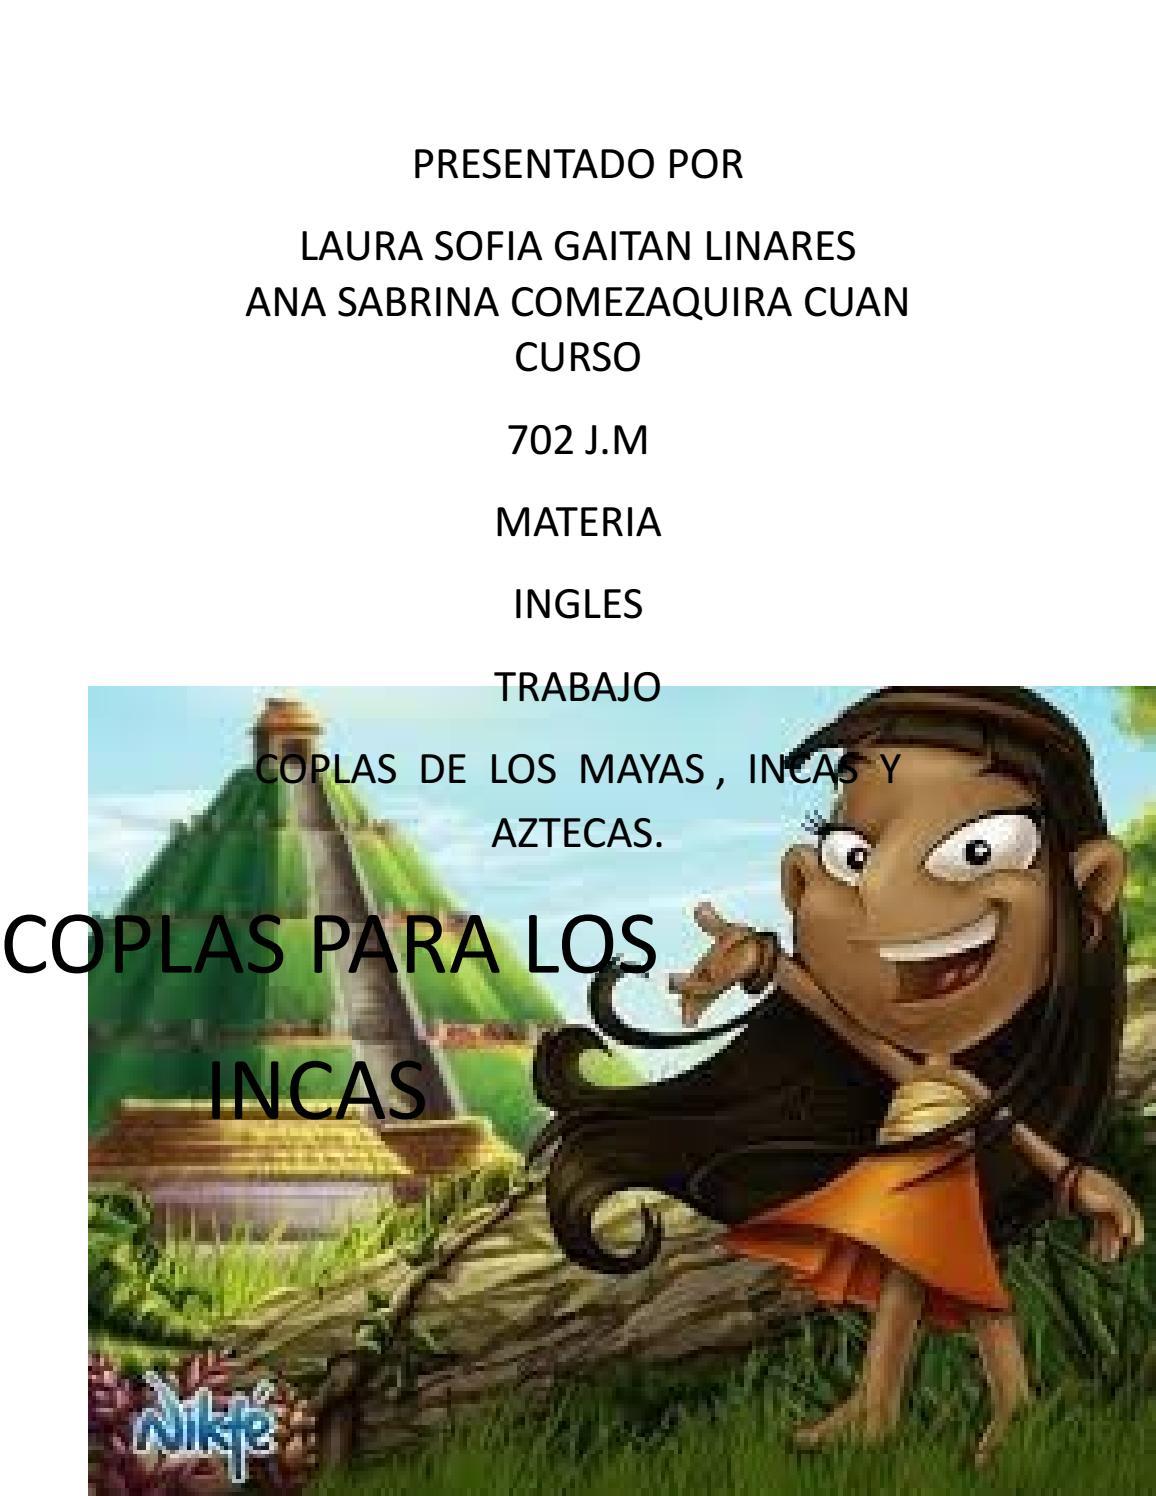 Coplas Cortas Nicaraguenses Coplas Nicaraguenses Cortas